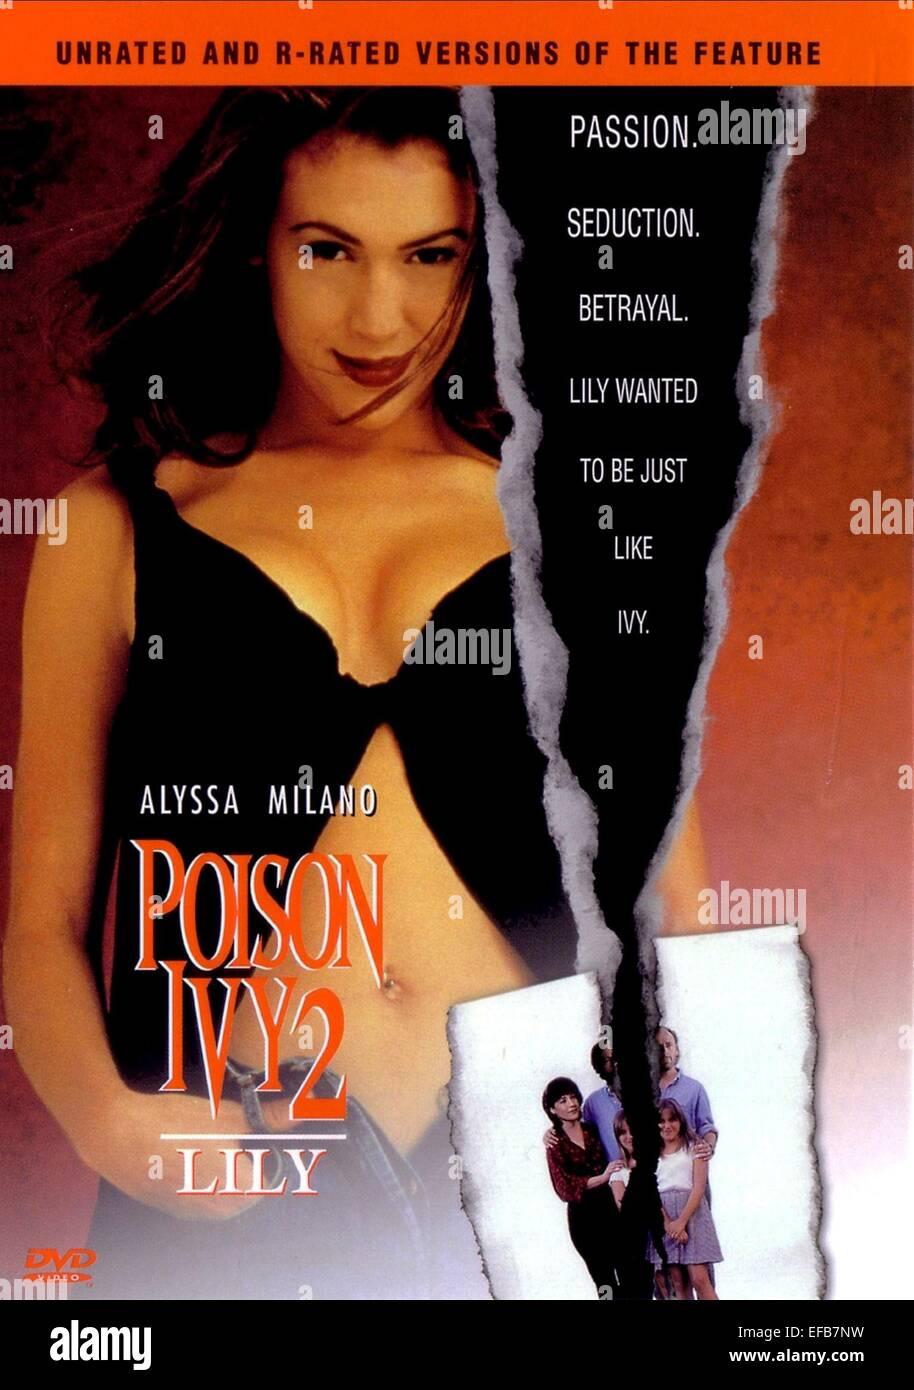 Alyssa Milano Poison Ivy 2 alyssa milano poison ivy 2 stock photos & alyssa milano